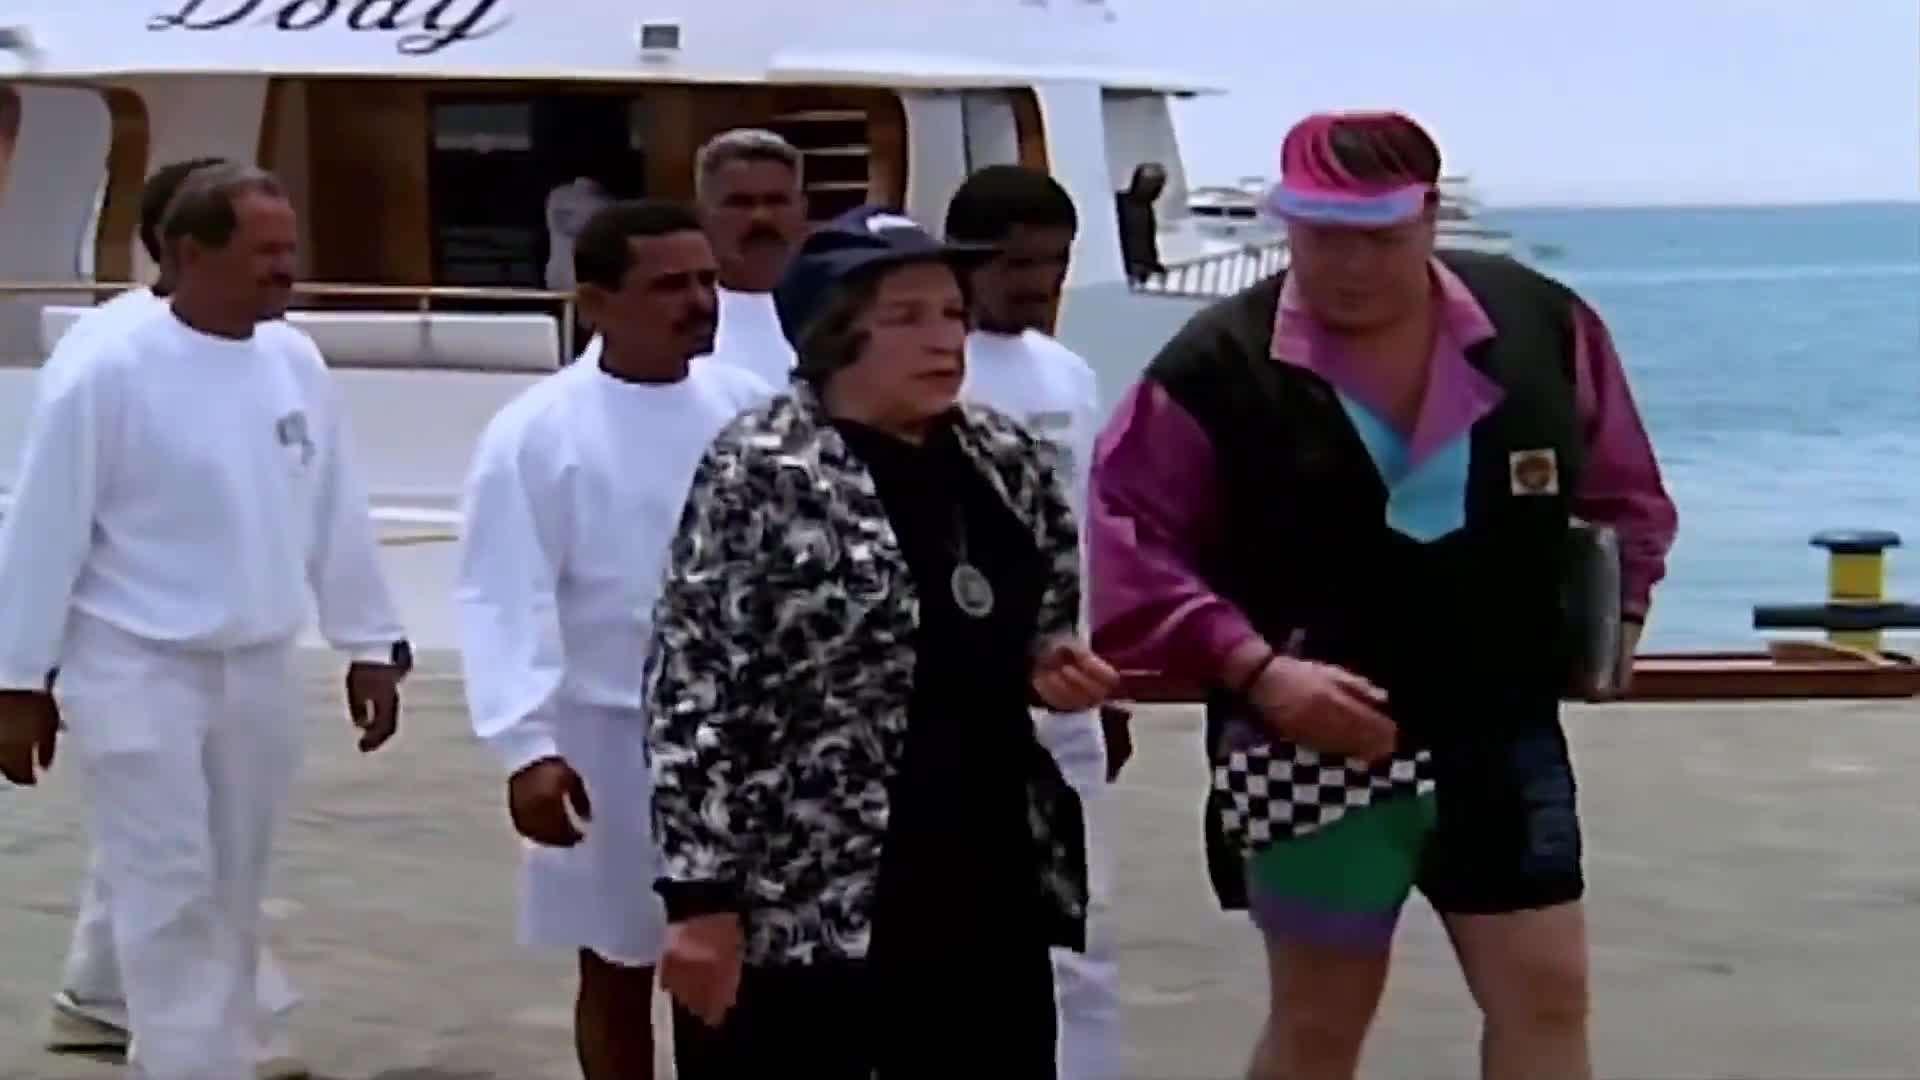 [فيلم][تورنت][تحميل][استاكوزا][1996][1080p][Web-DL] 5 arabp2p.com